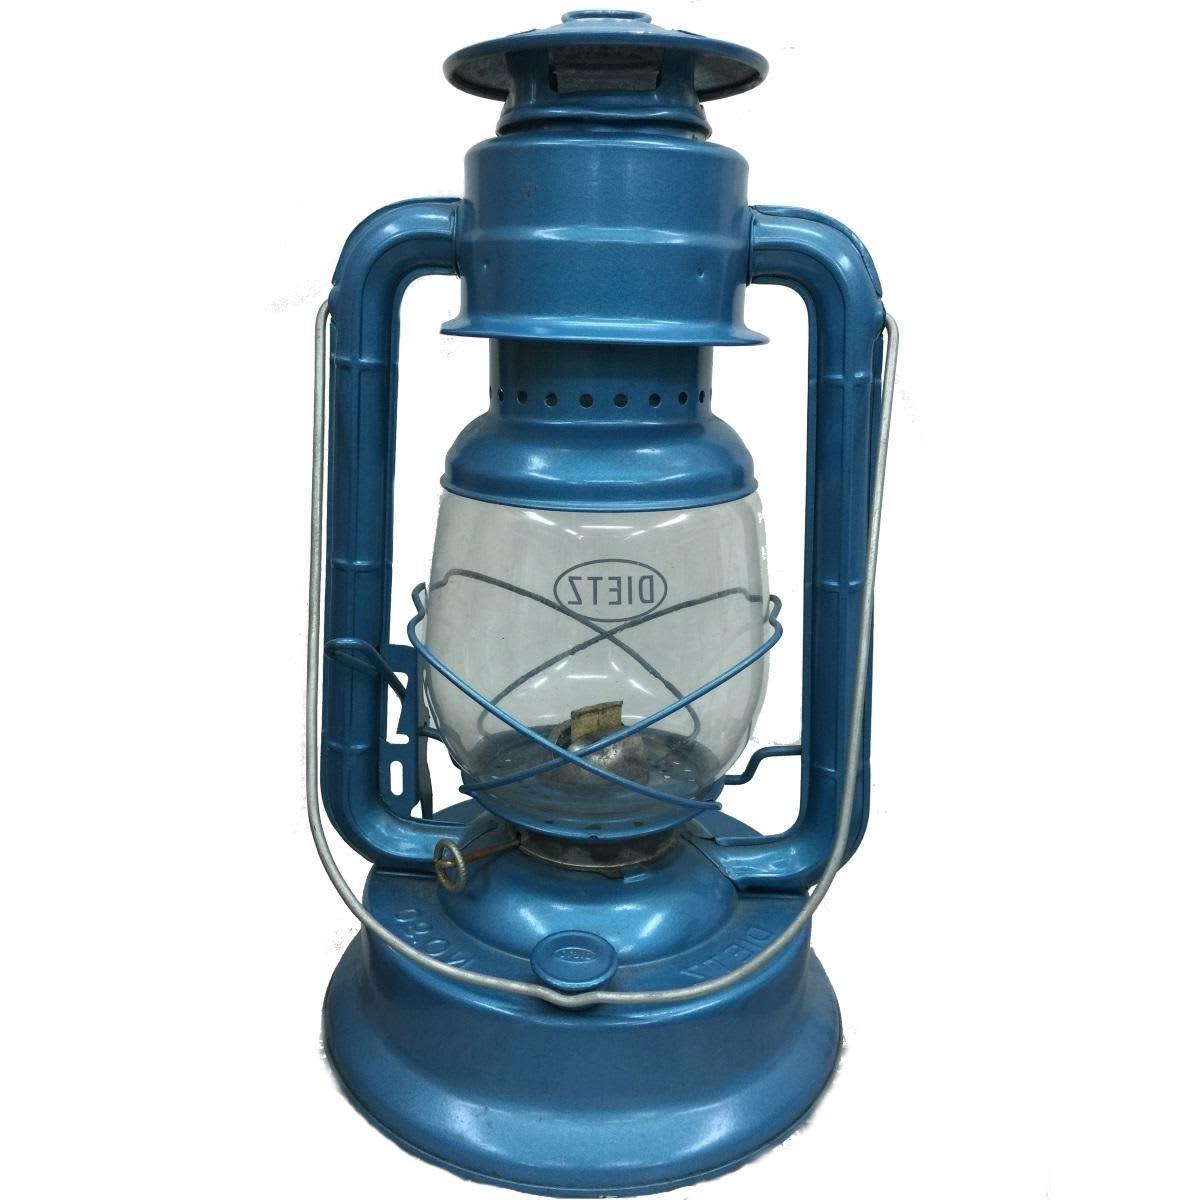 Dietz Kerosene Lantern Large With Regard To Trendy Outdoor Kerosene Lanterns (Gallery 12 of 20)